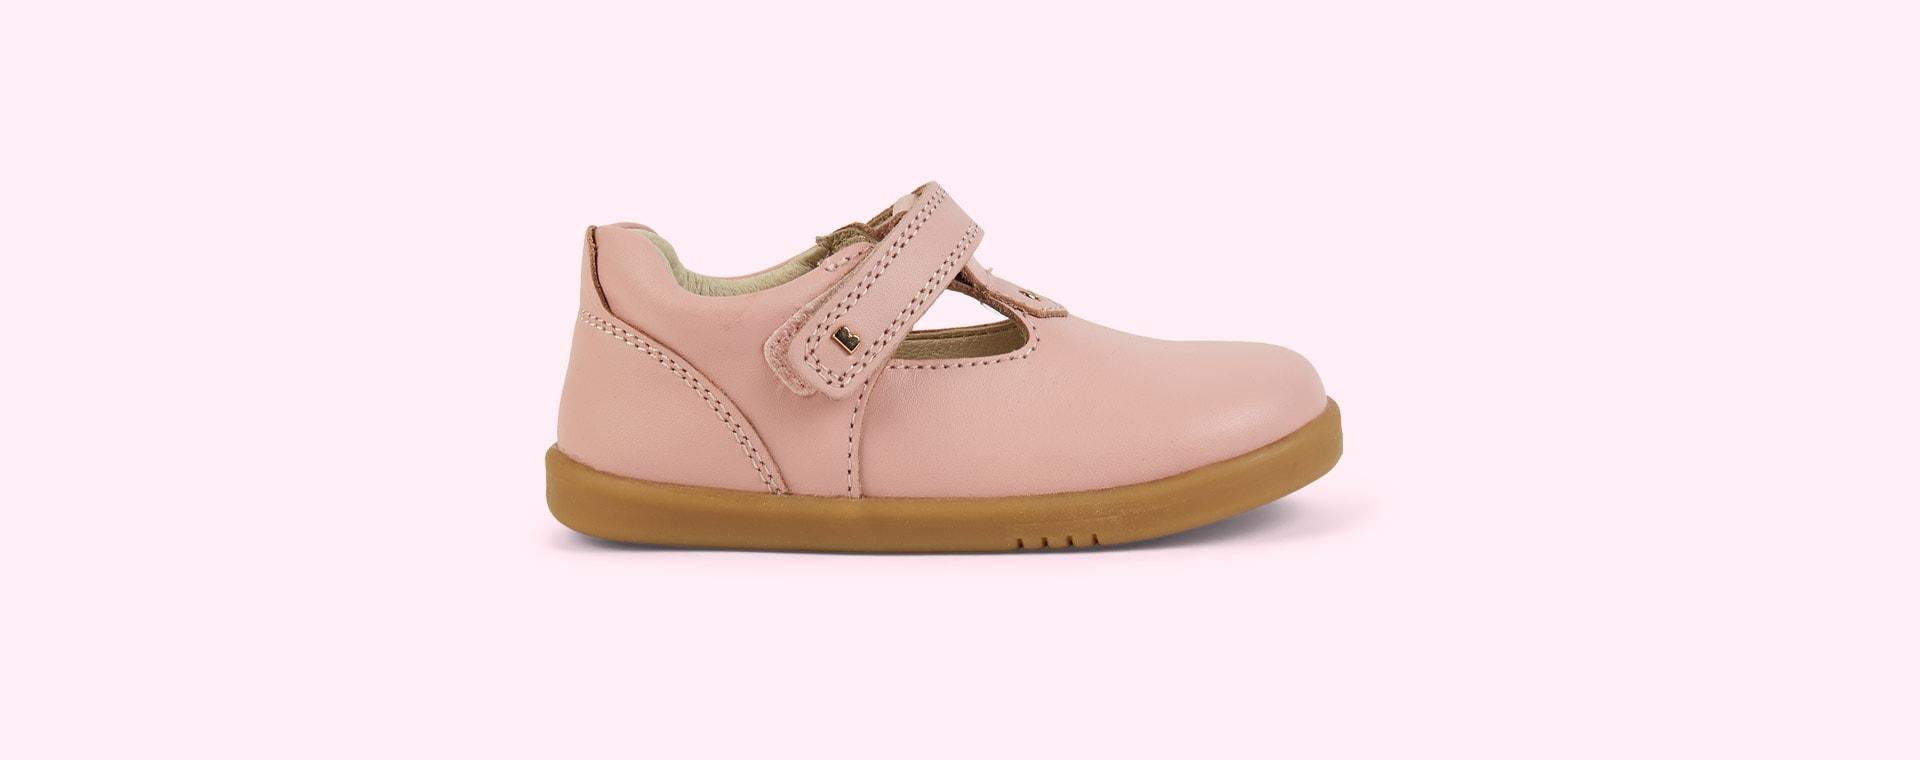 Seashell Bobux I-Walk Louise T-bar Shoe